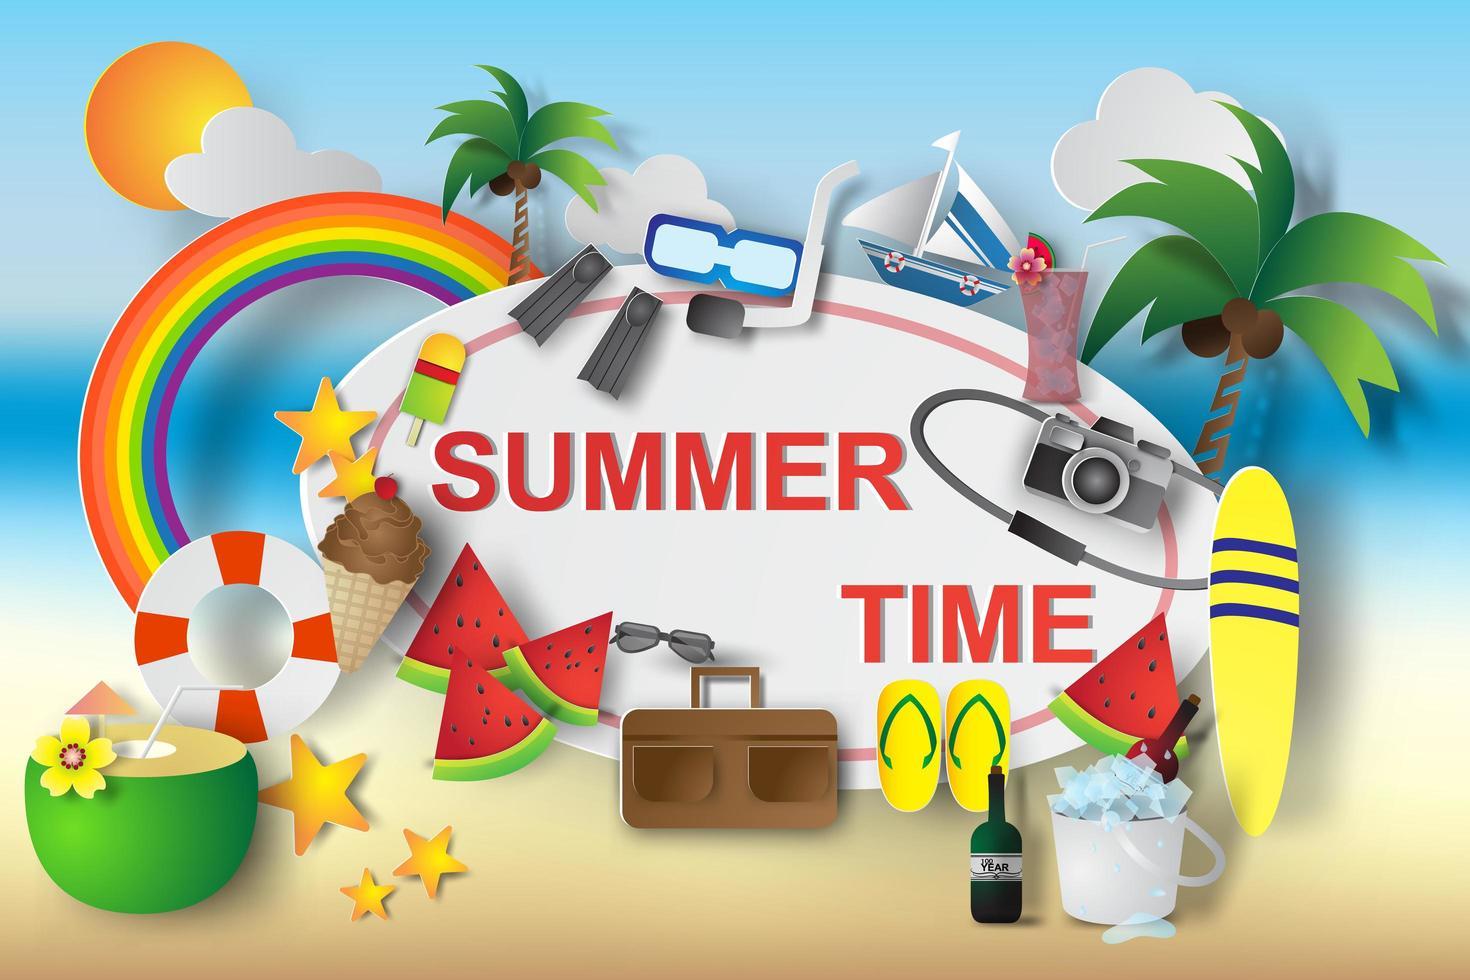 Paper Art Summer Time Design Elements  vector